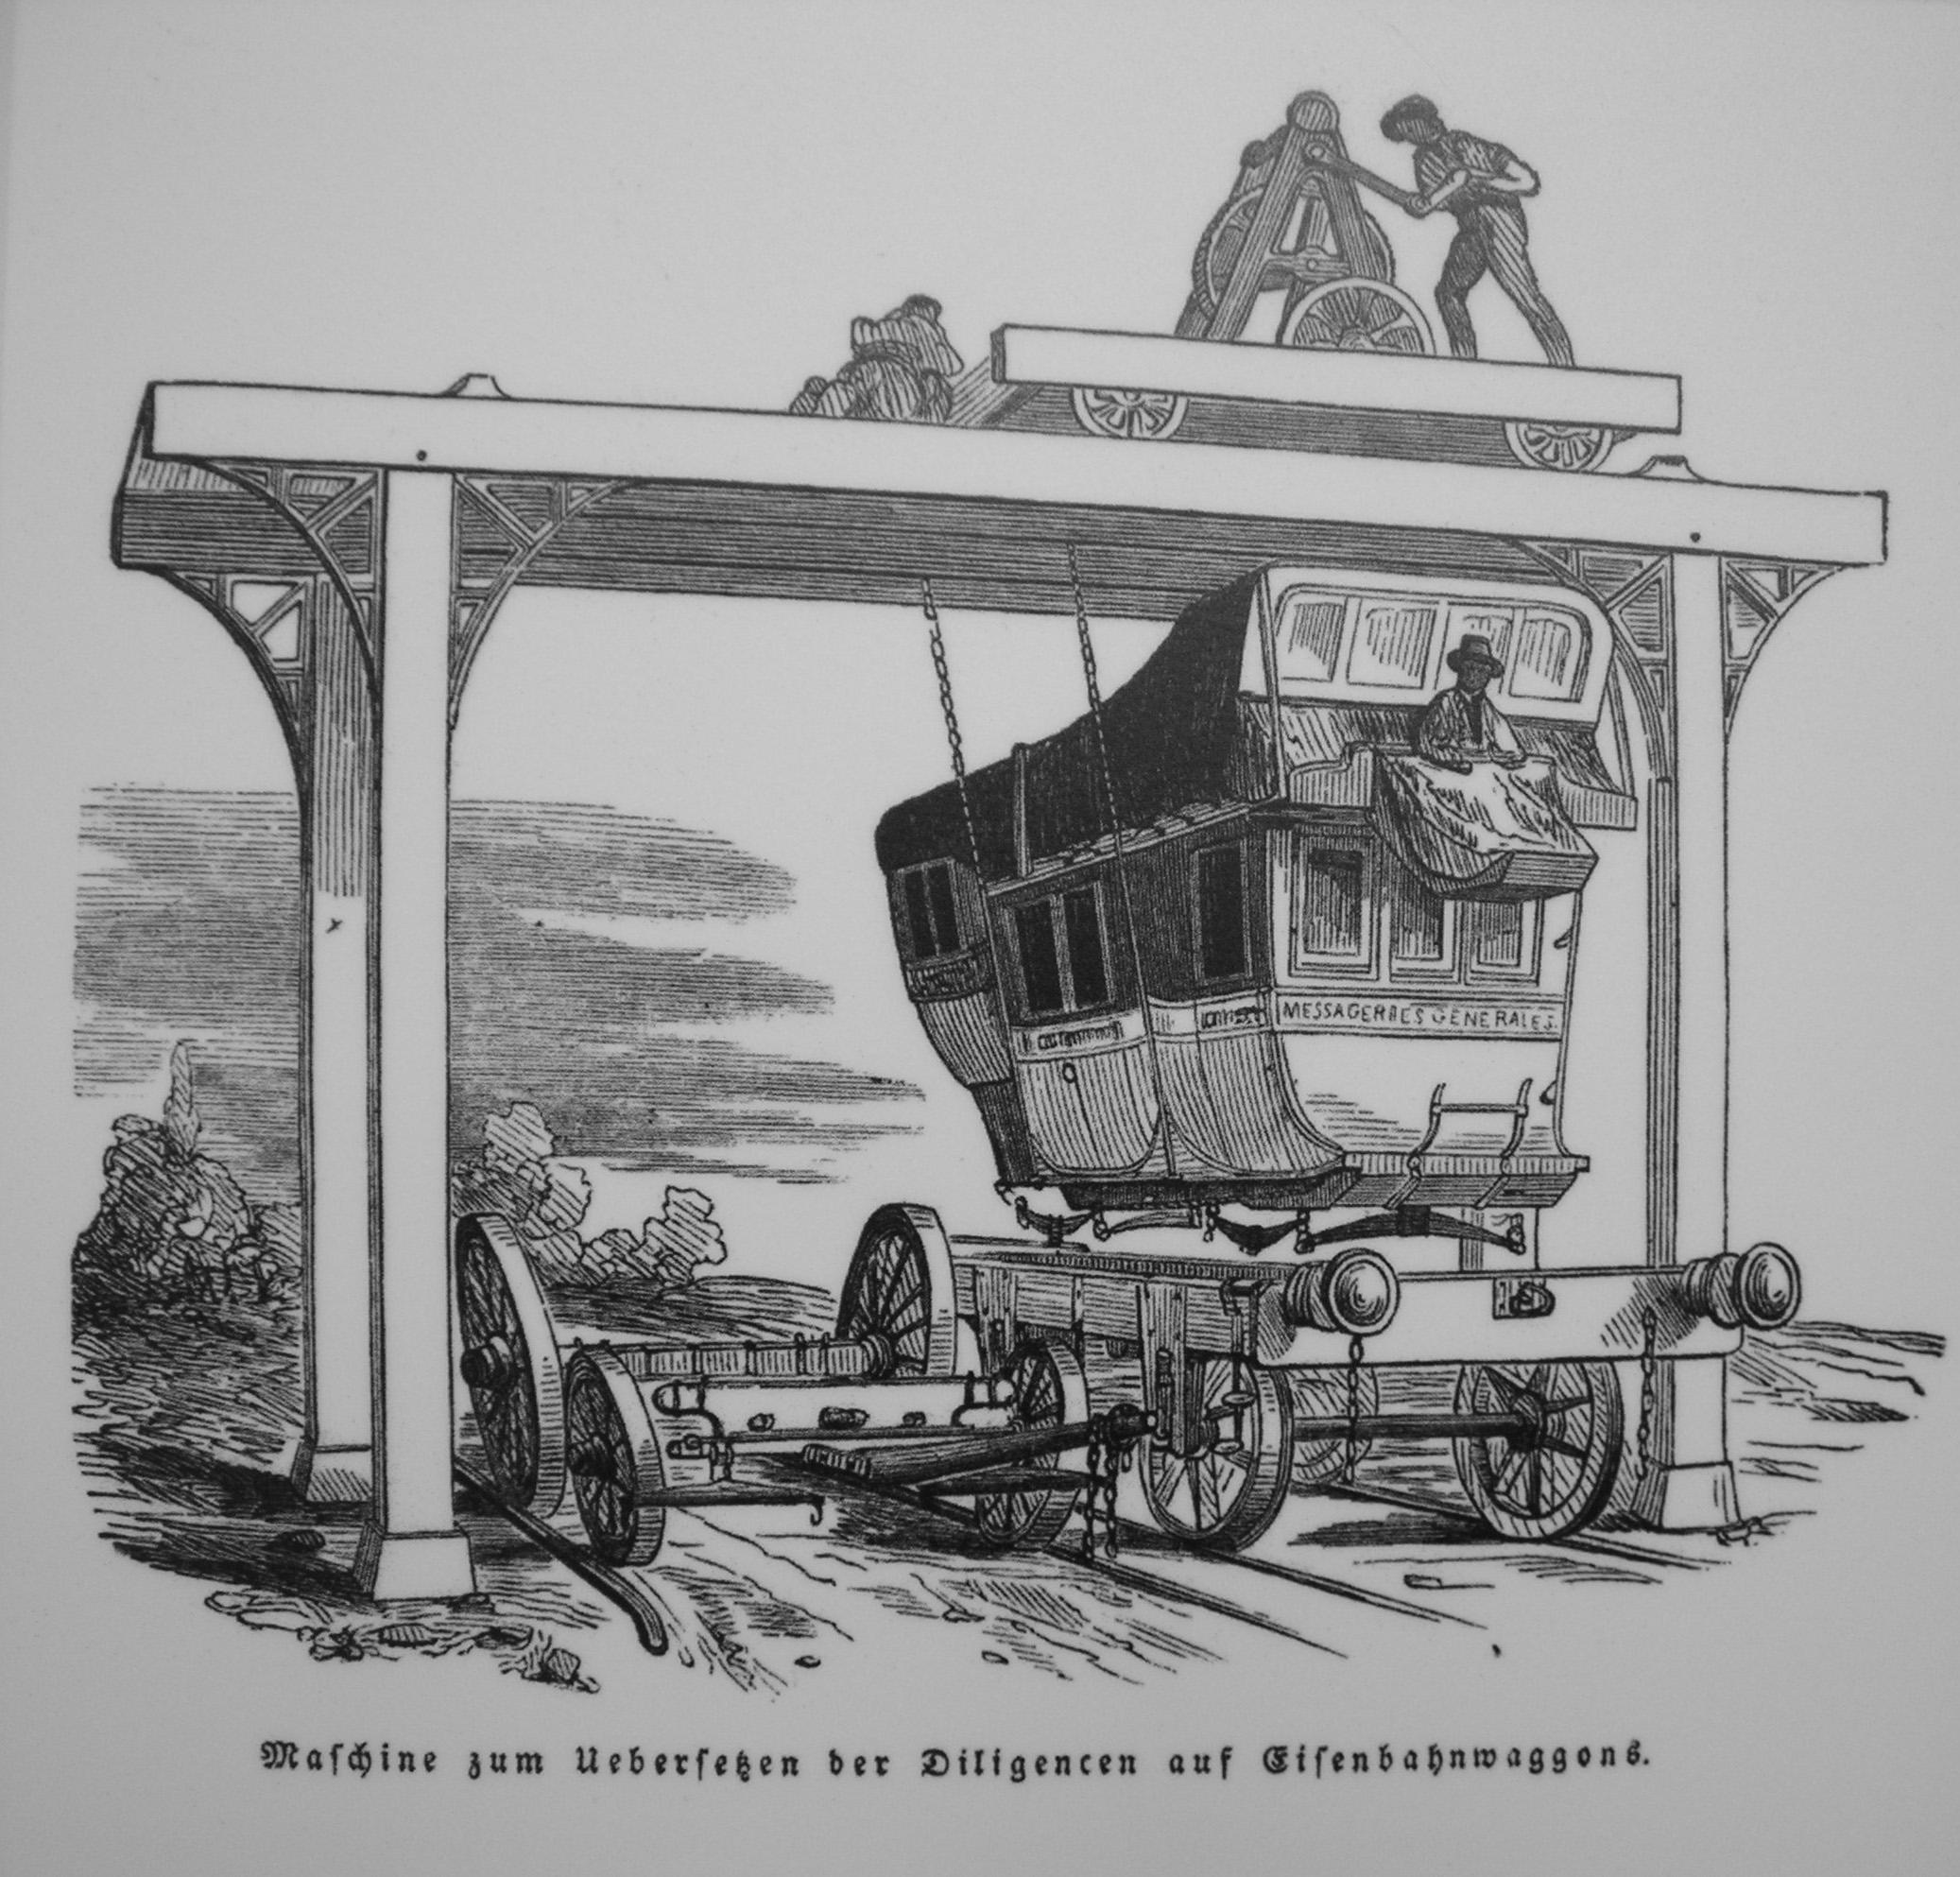 Drawn railroad transportation Of Transportation A Of Freight